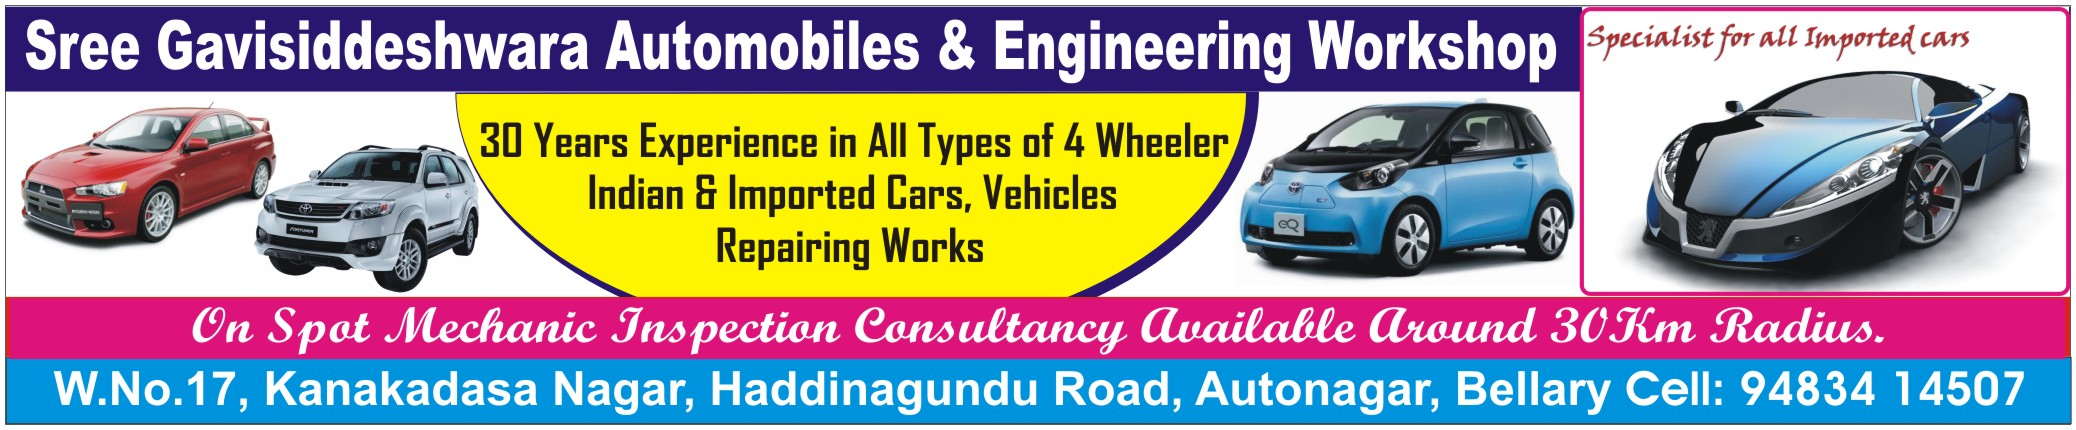 Sree Gavisiddeshwara Automobile Engineering Works